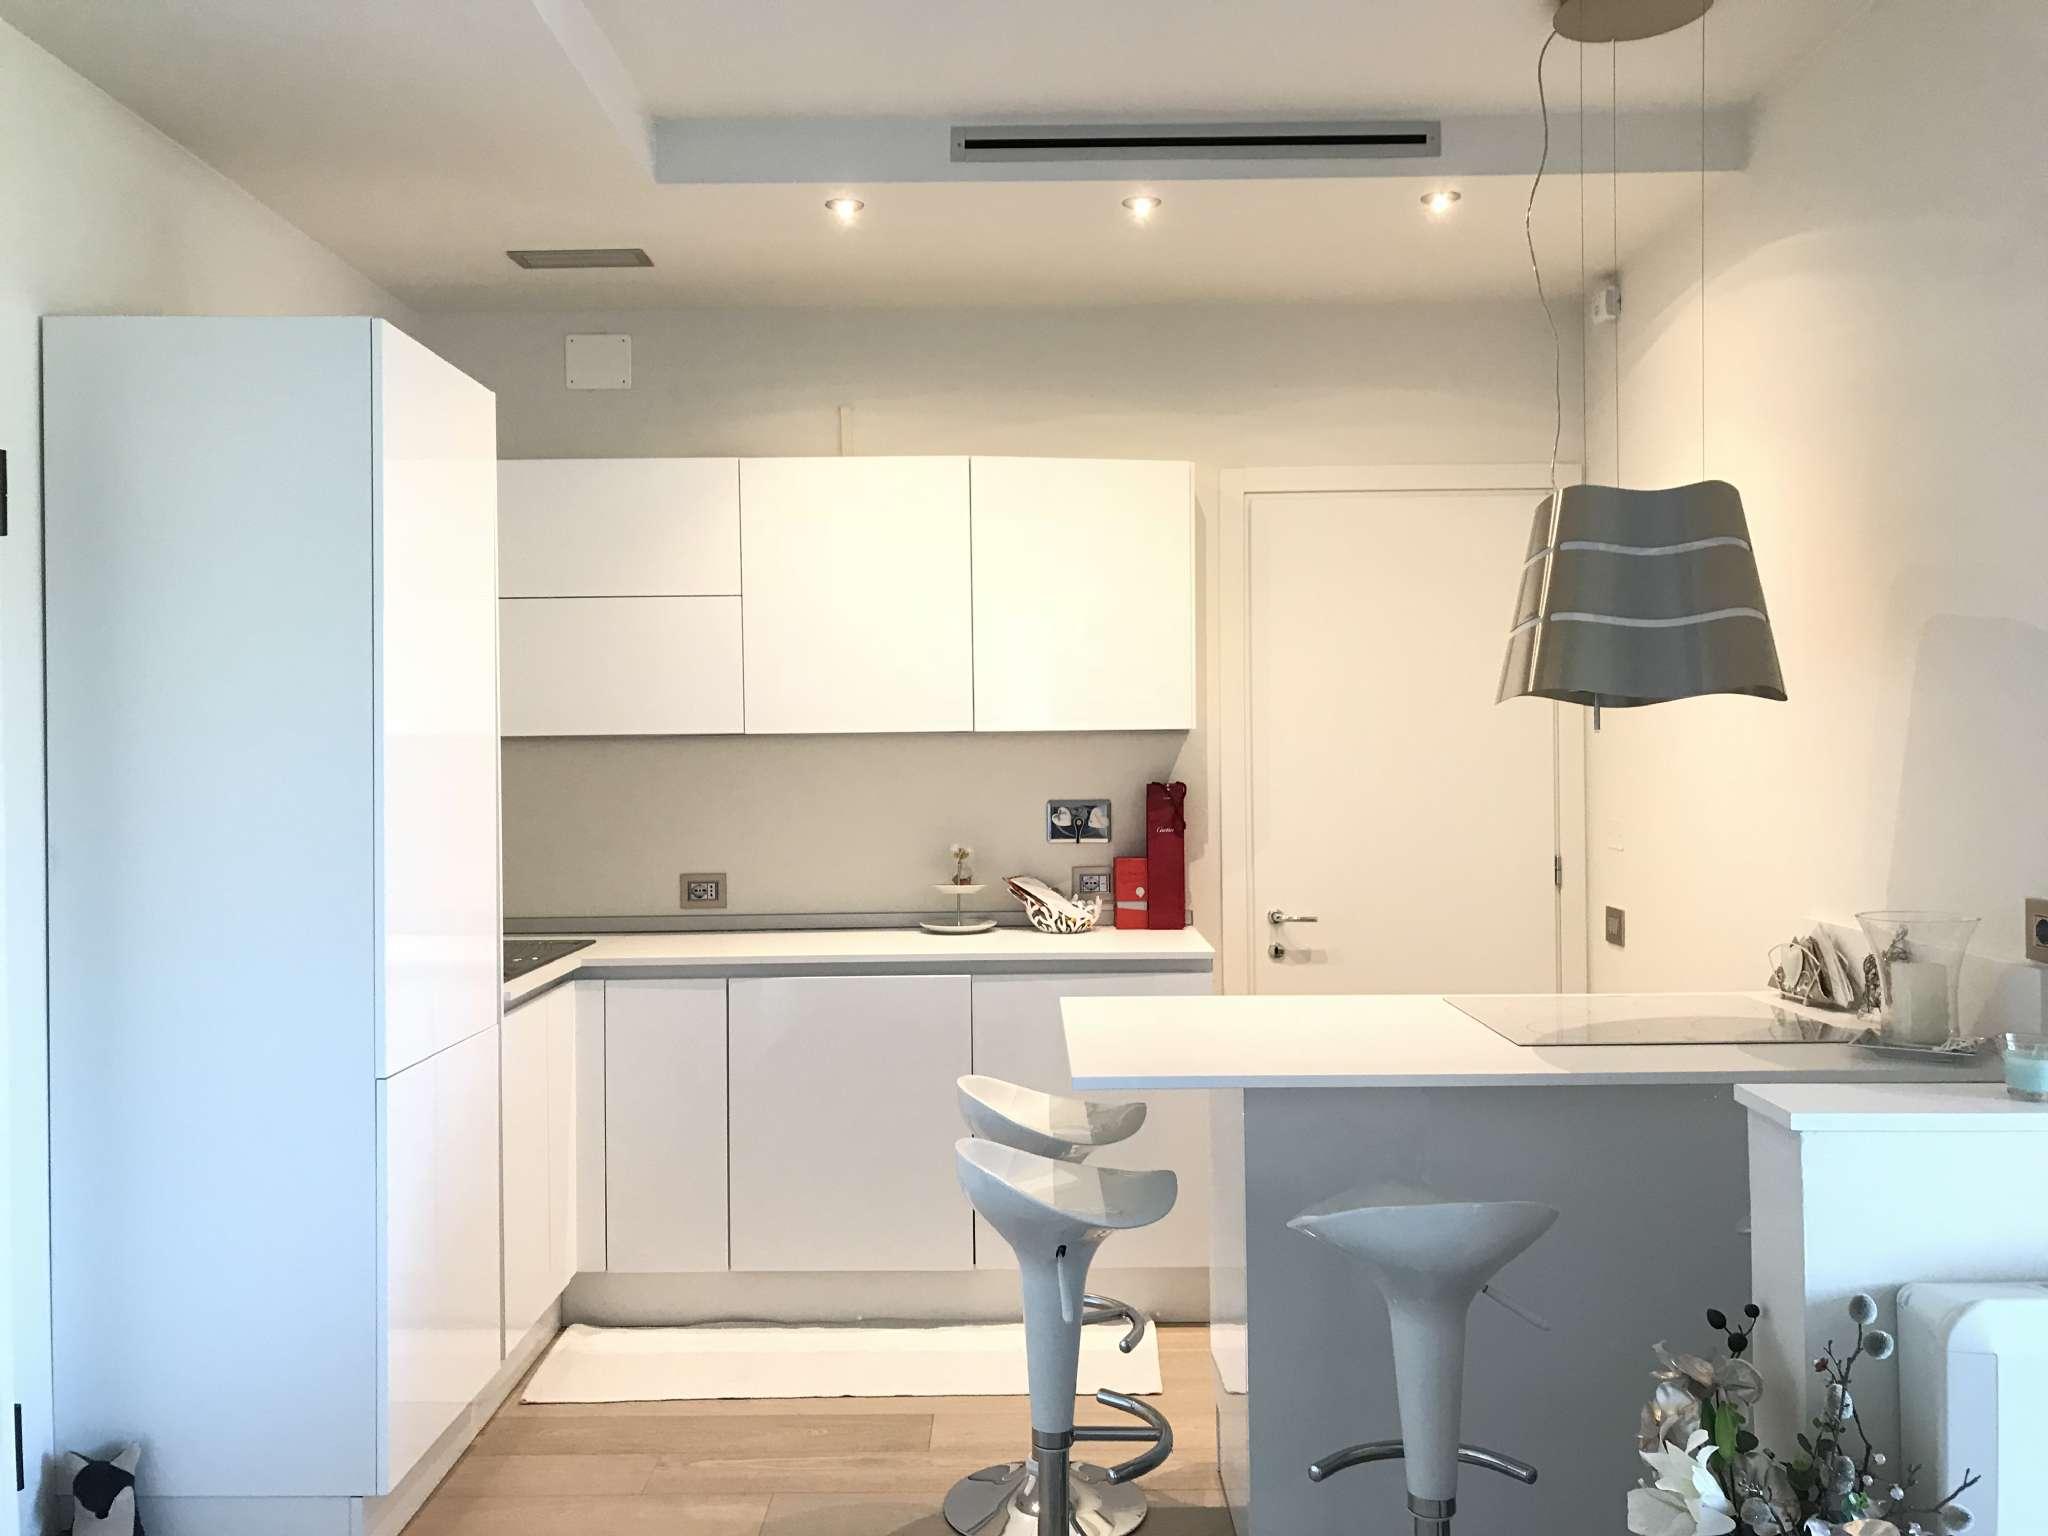 Appartamento in Vendita a Firenze Periferia Nord: 2 locali, 50 mq